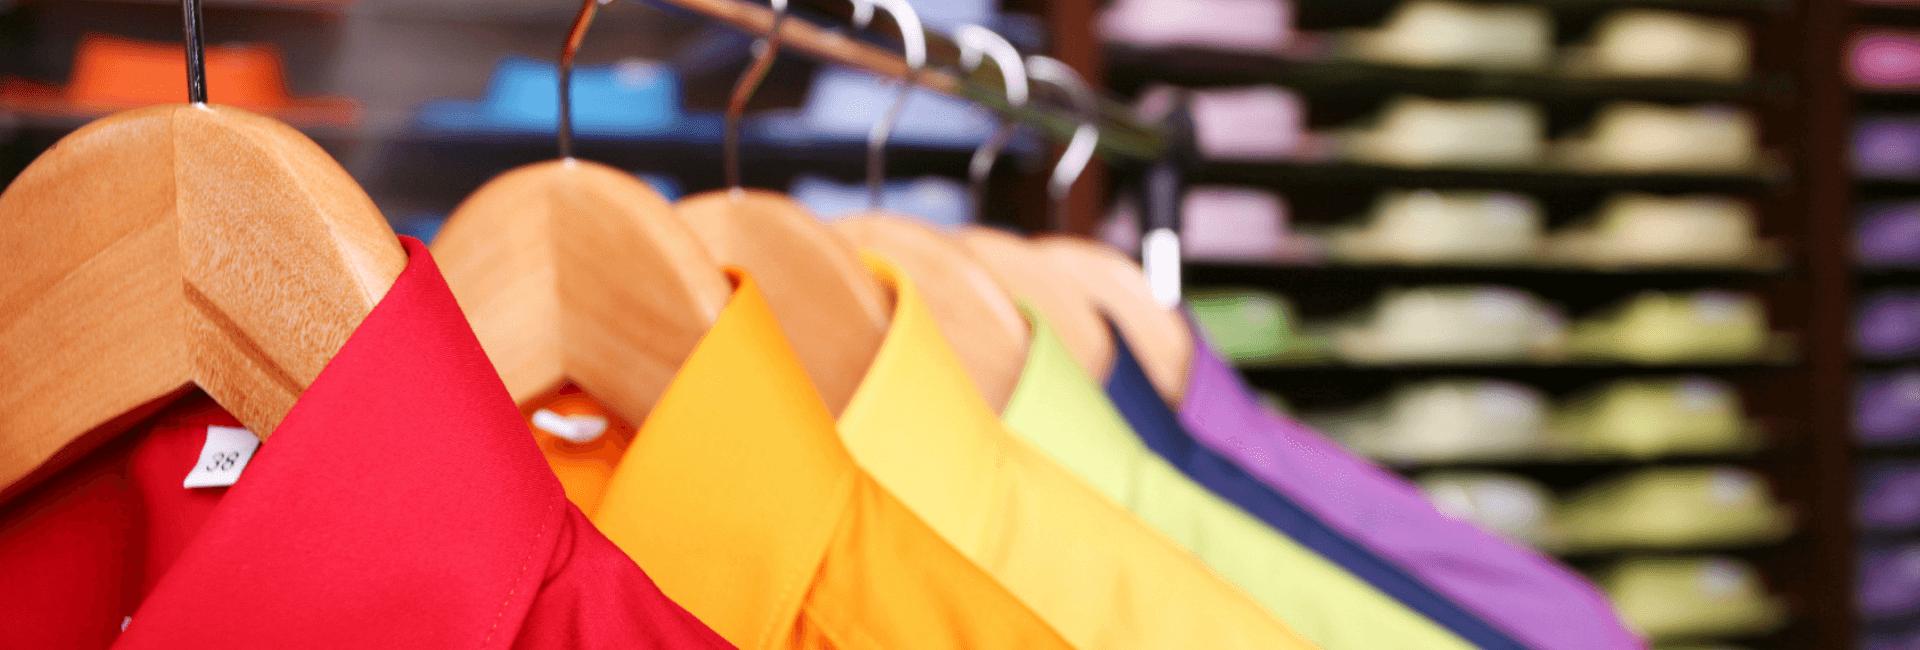 shirts clothing on hangers